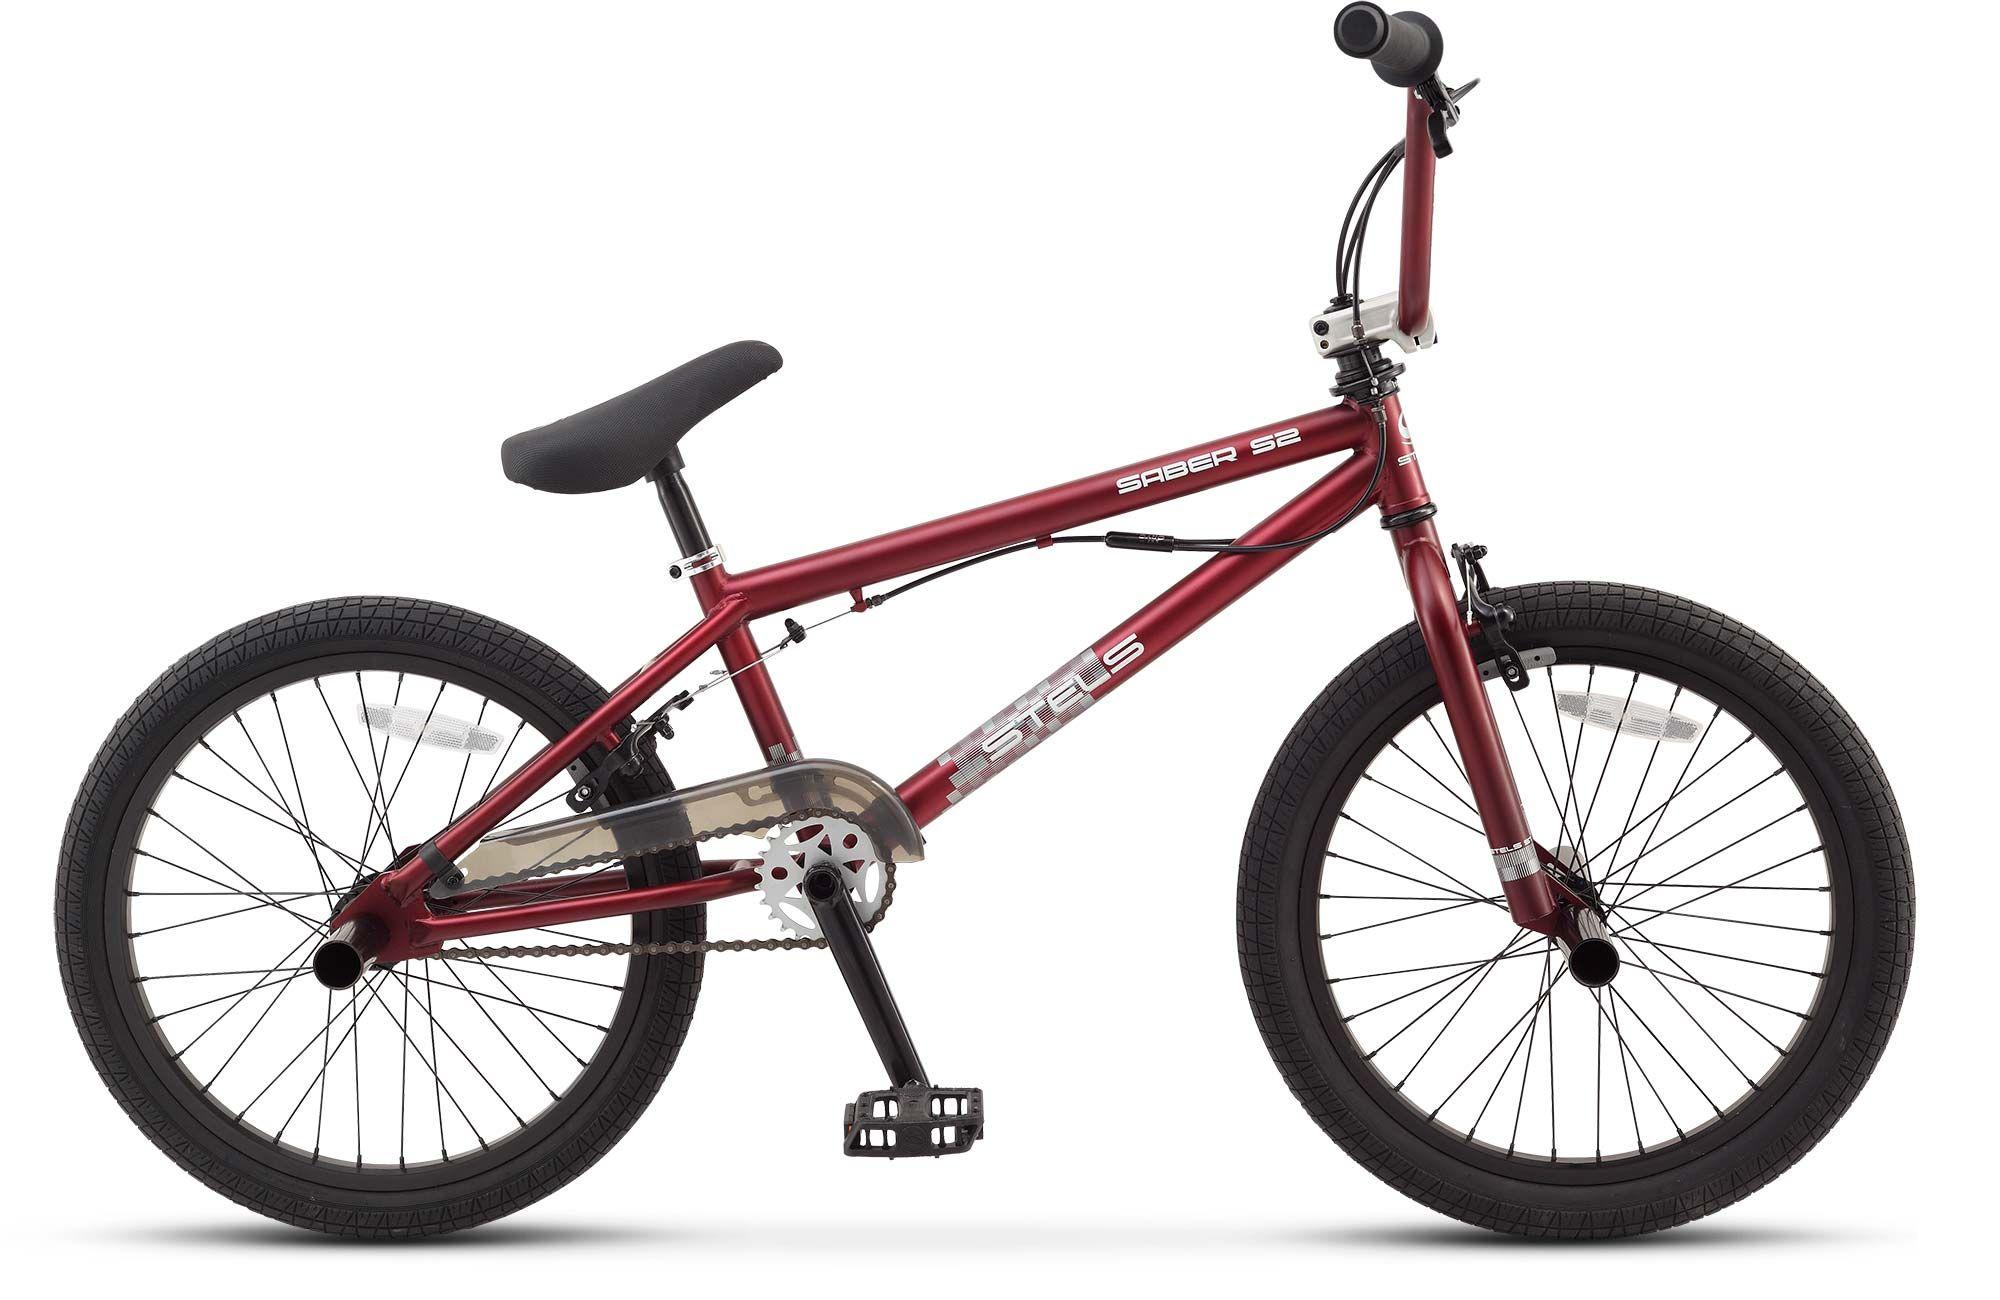 Велосипед Stels BMX Saber S2 2016,  Трюковые  - артикул:262021